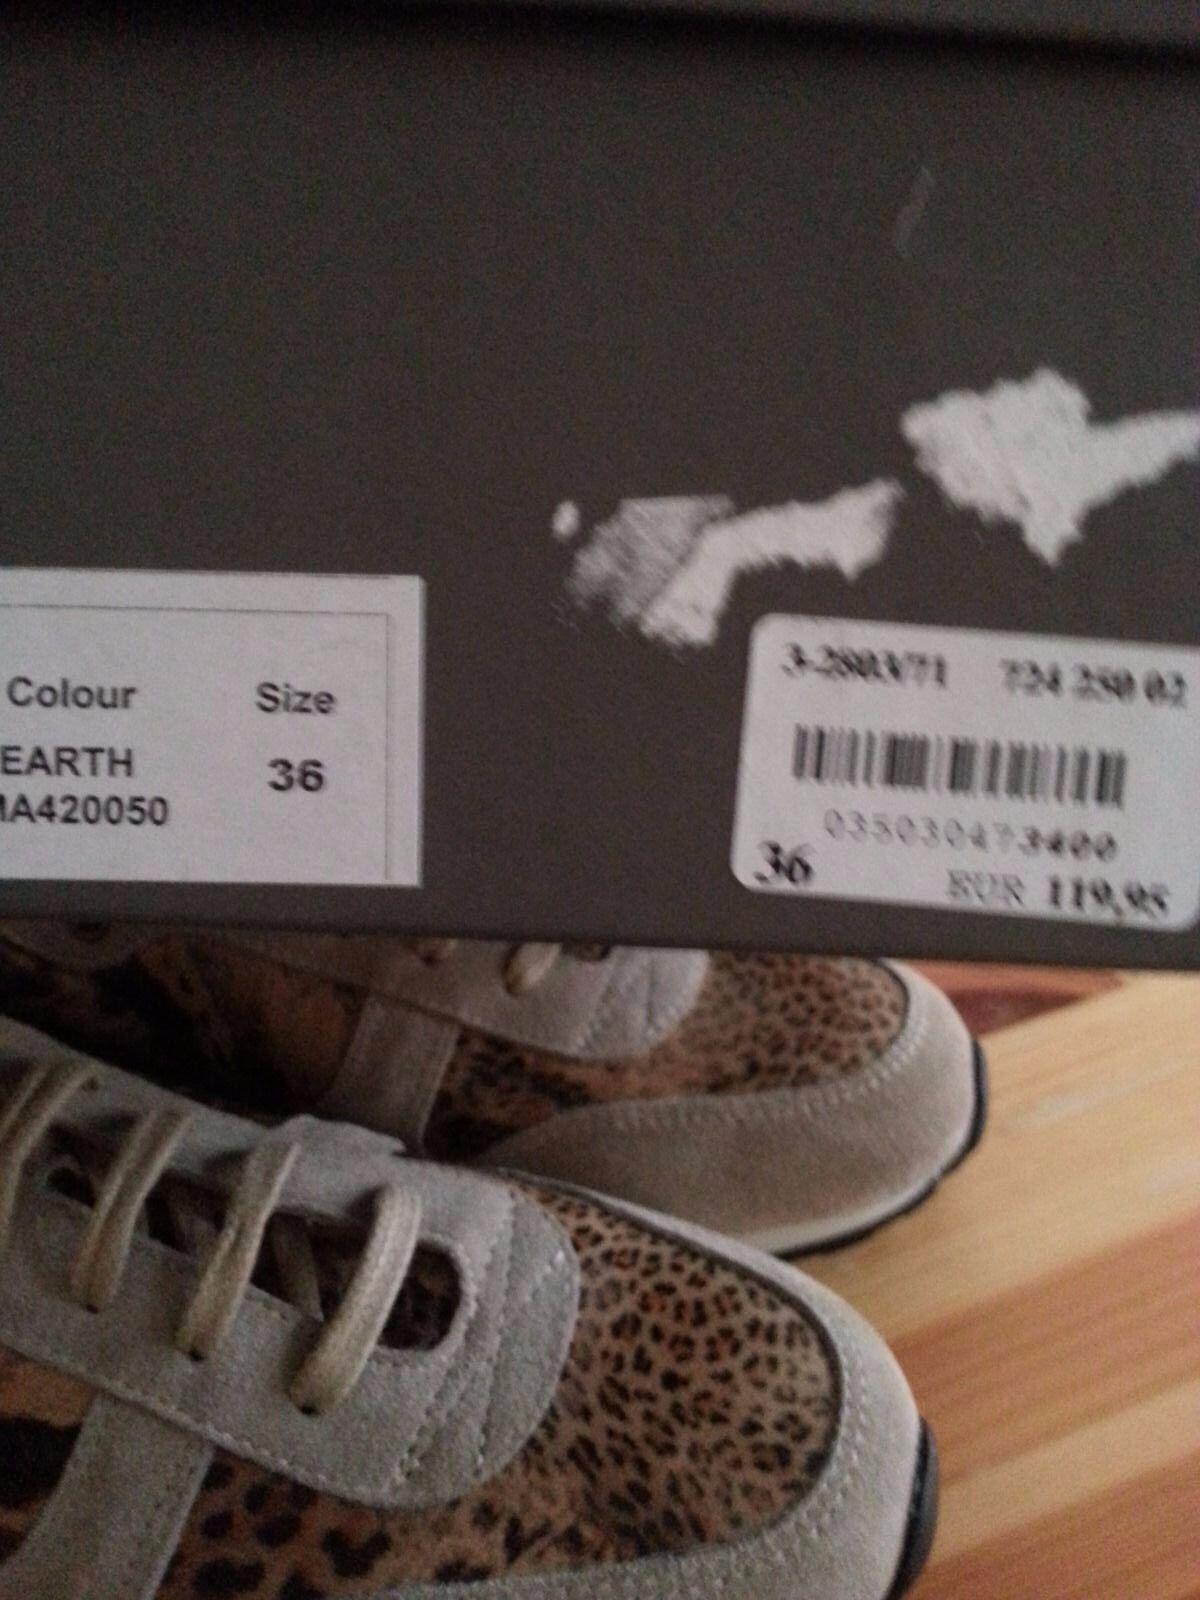 Brax Damen Sneaker Schuhe  Gr 36 Animal Print  echt Leder Neu mit Karton NP